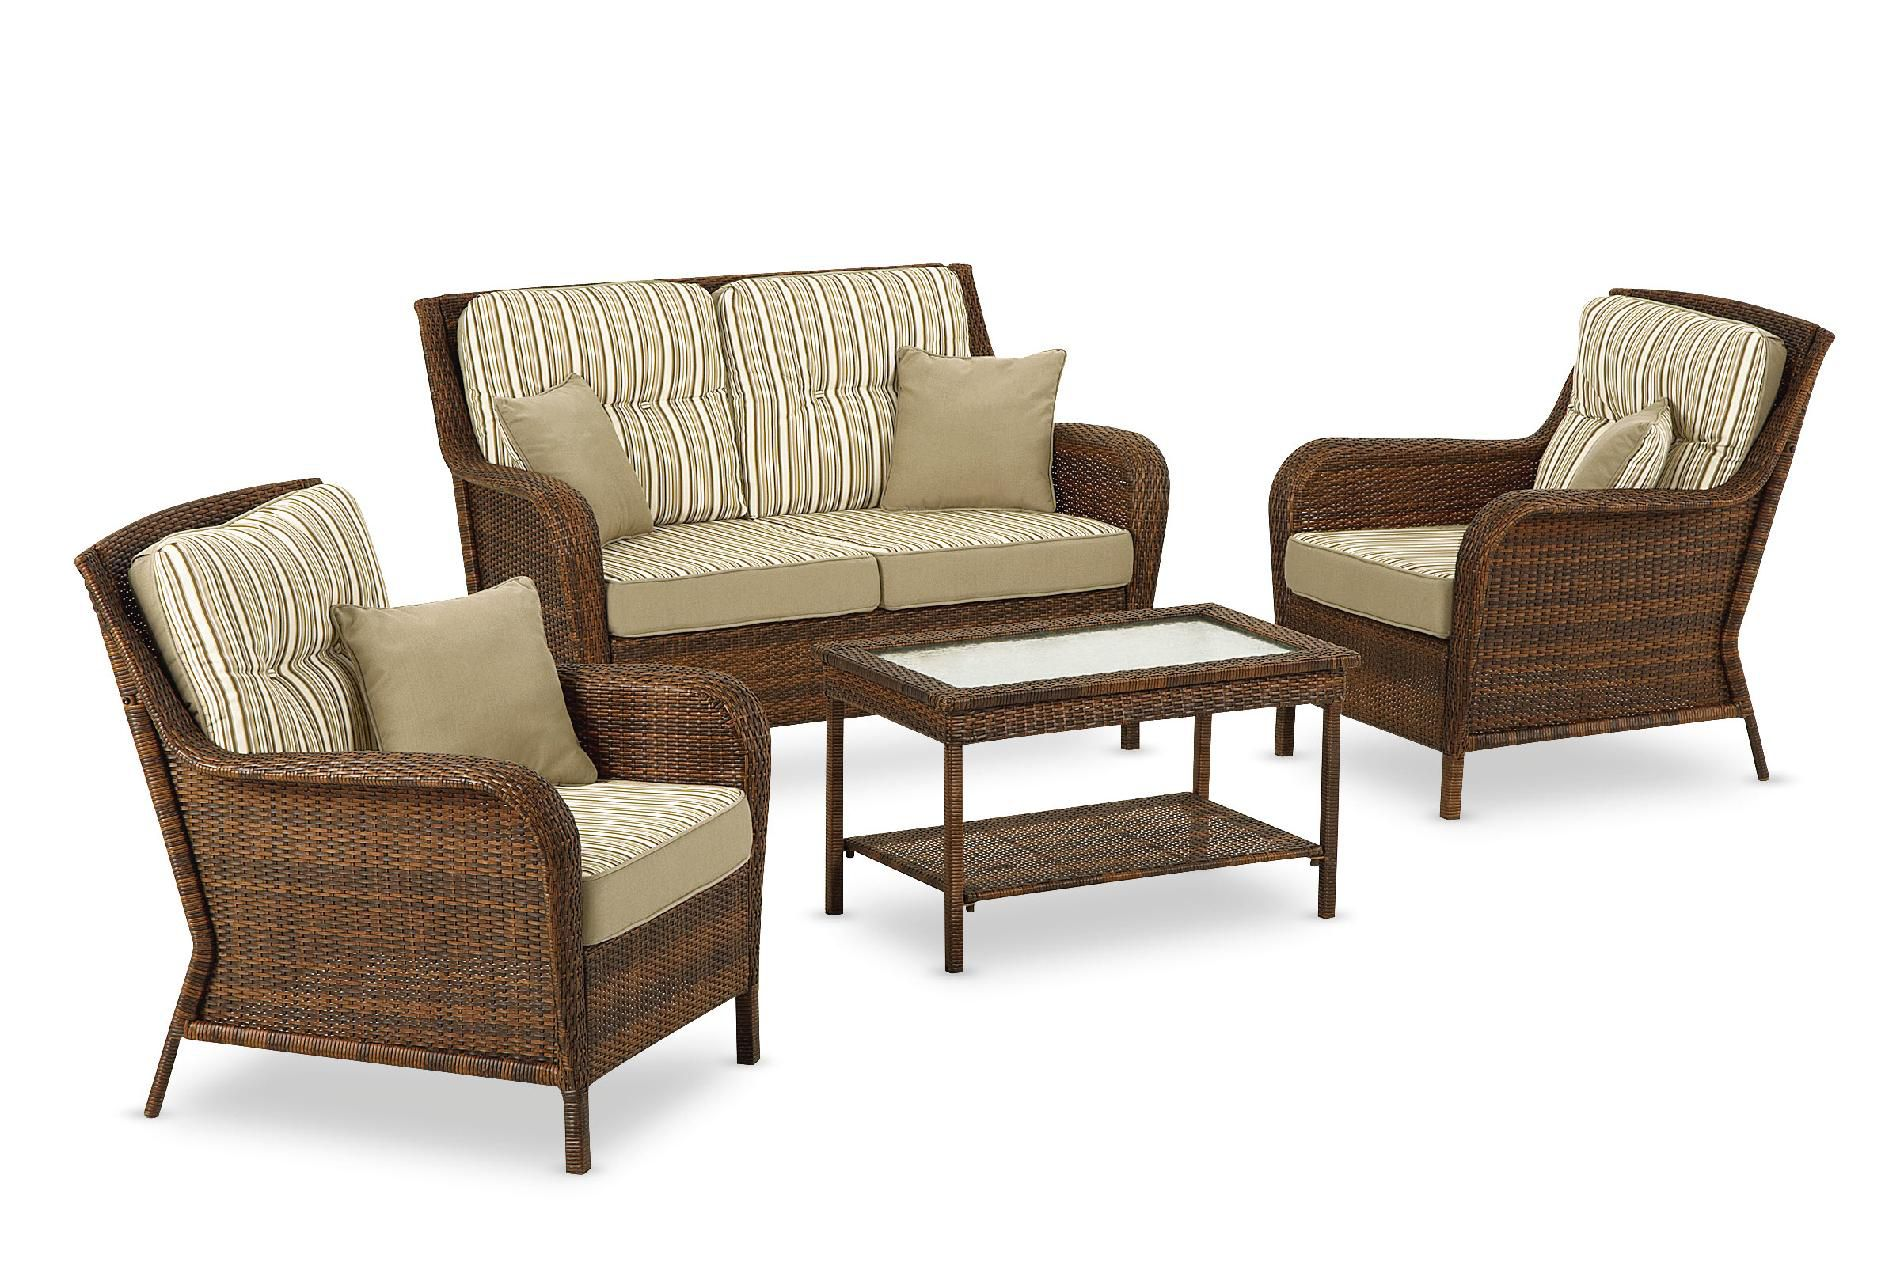 Ty Pennington Style Mayfield 4 Pc. Deep Seating Set